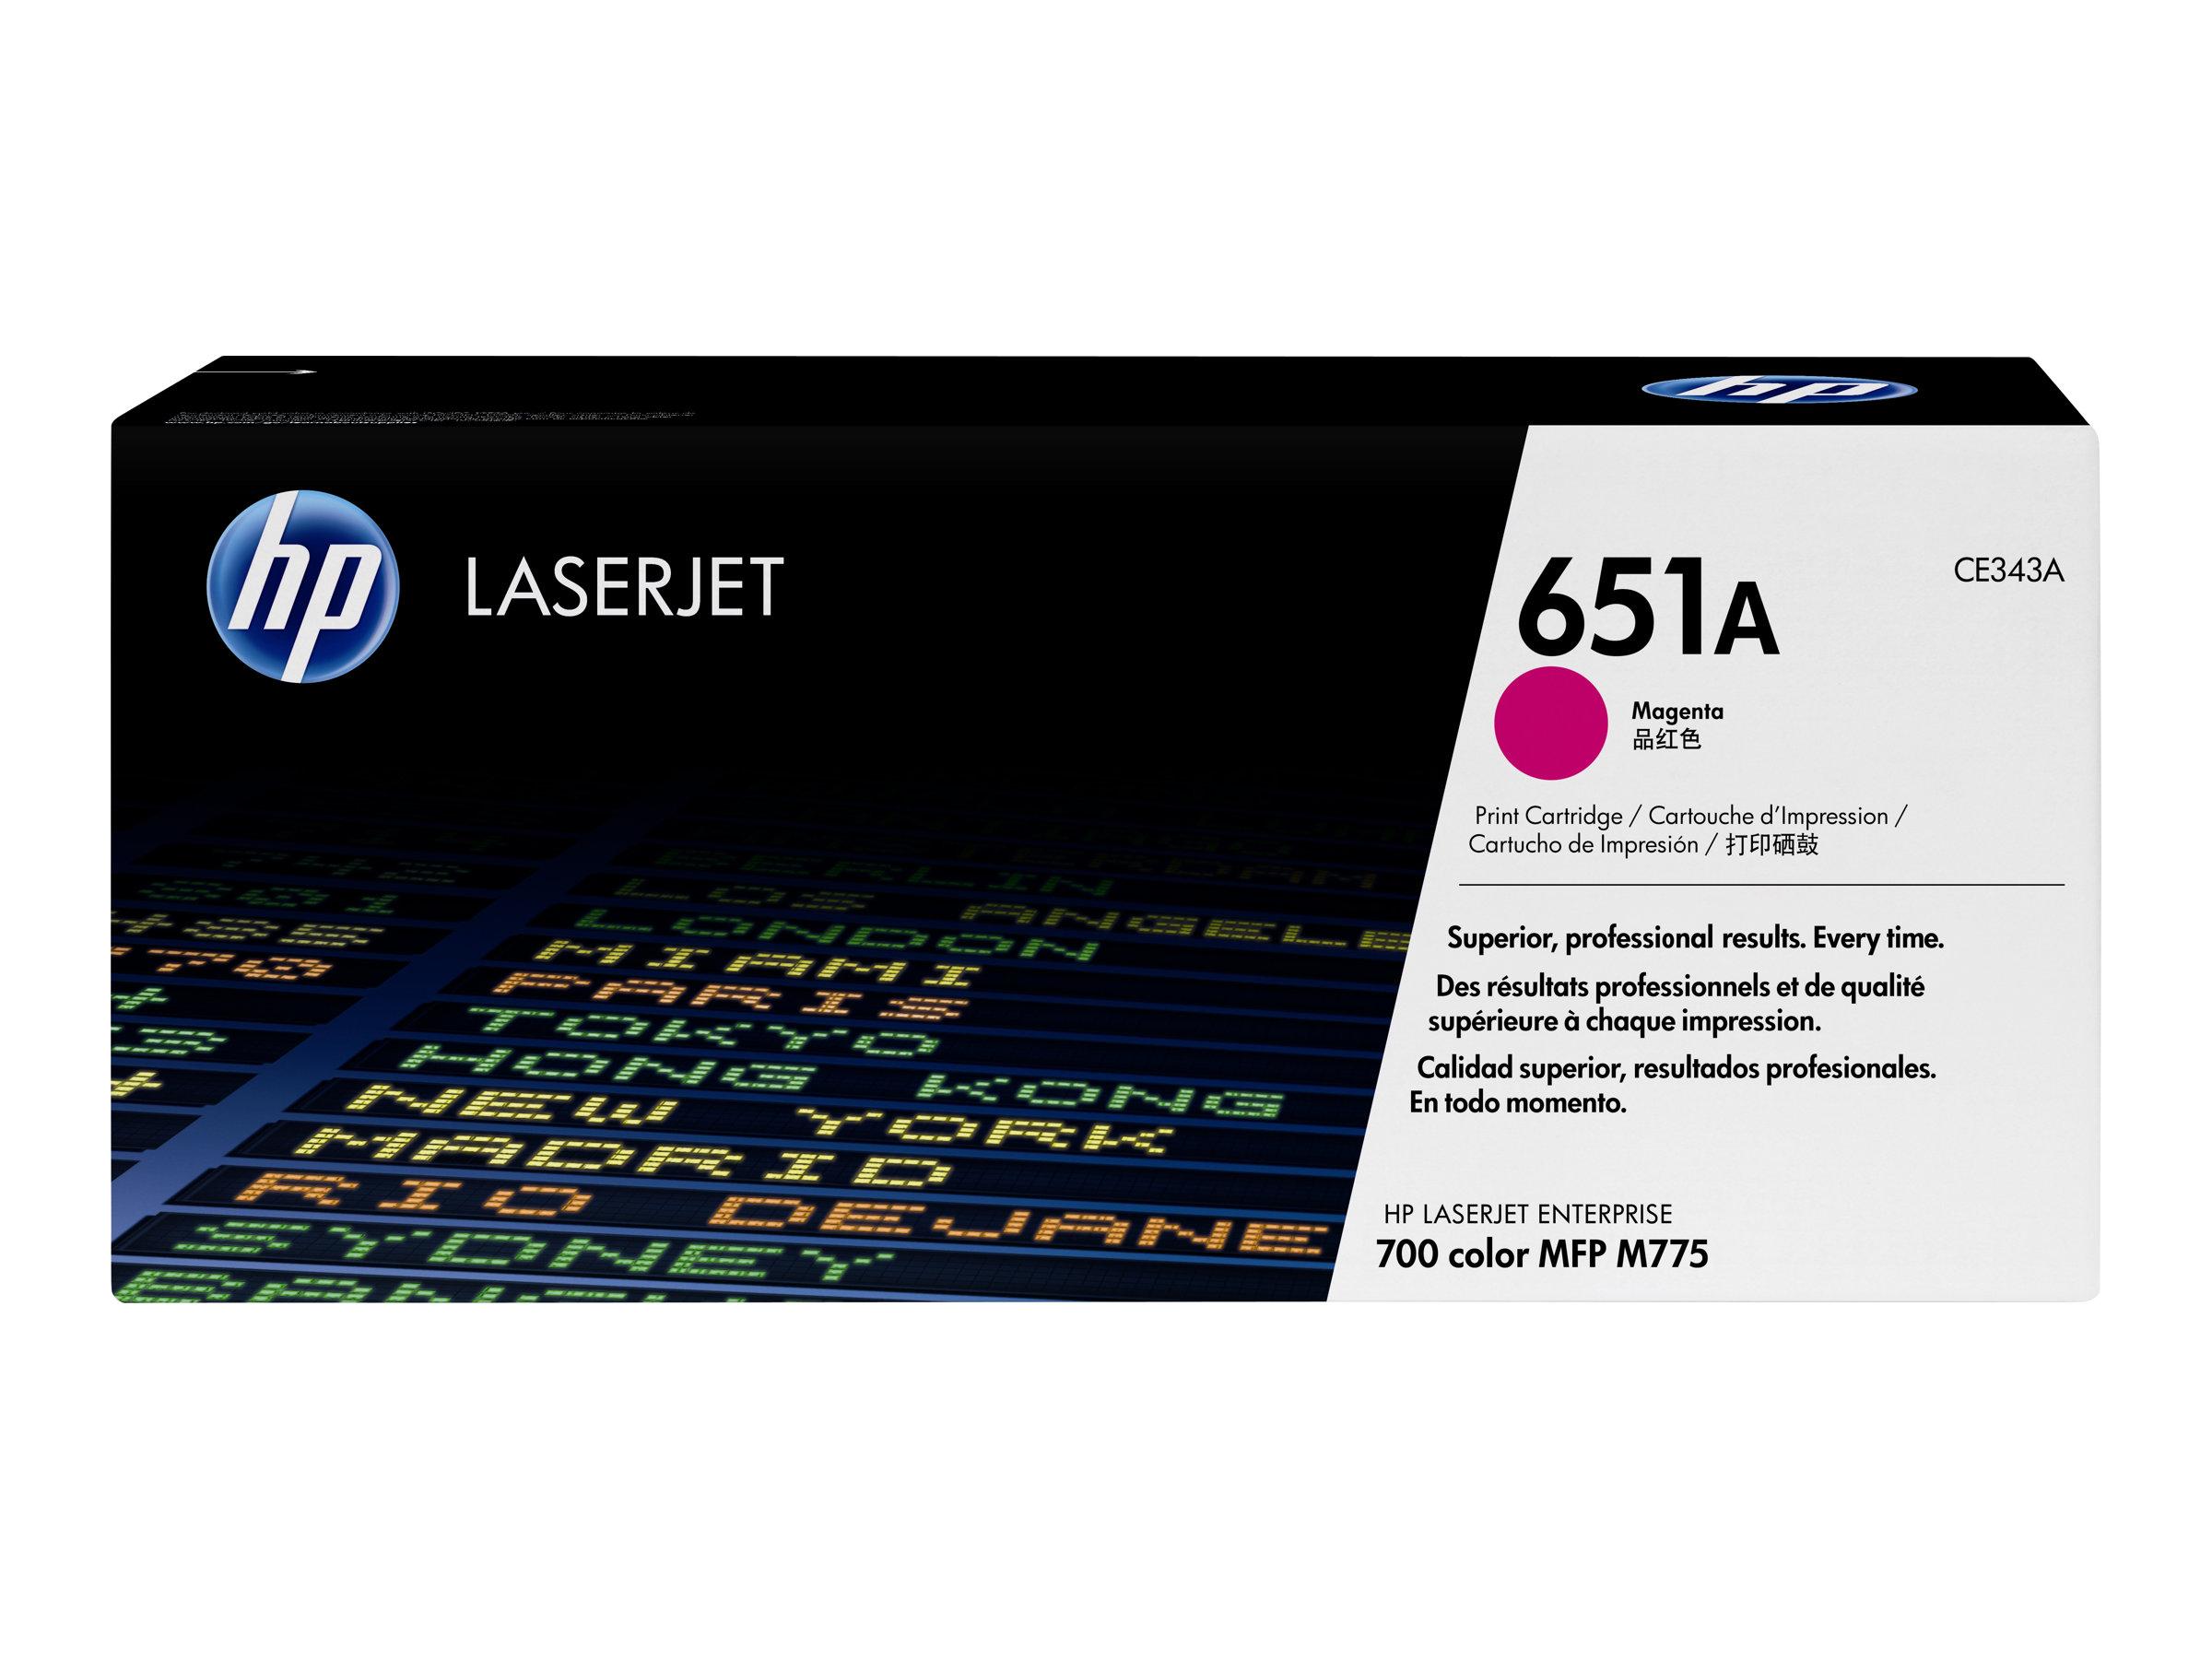 HP 651A - pack de 1 - 1 - magenta - originale - LaserJet - cartouche de toner (CE343A)